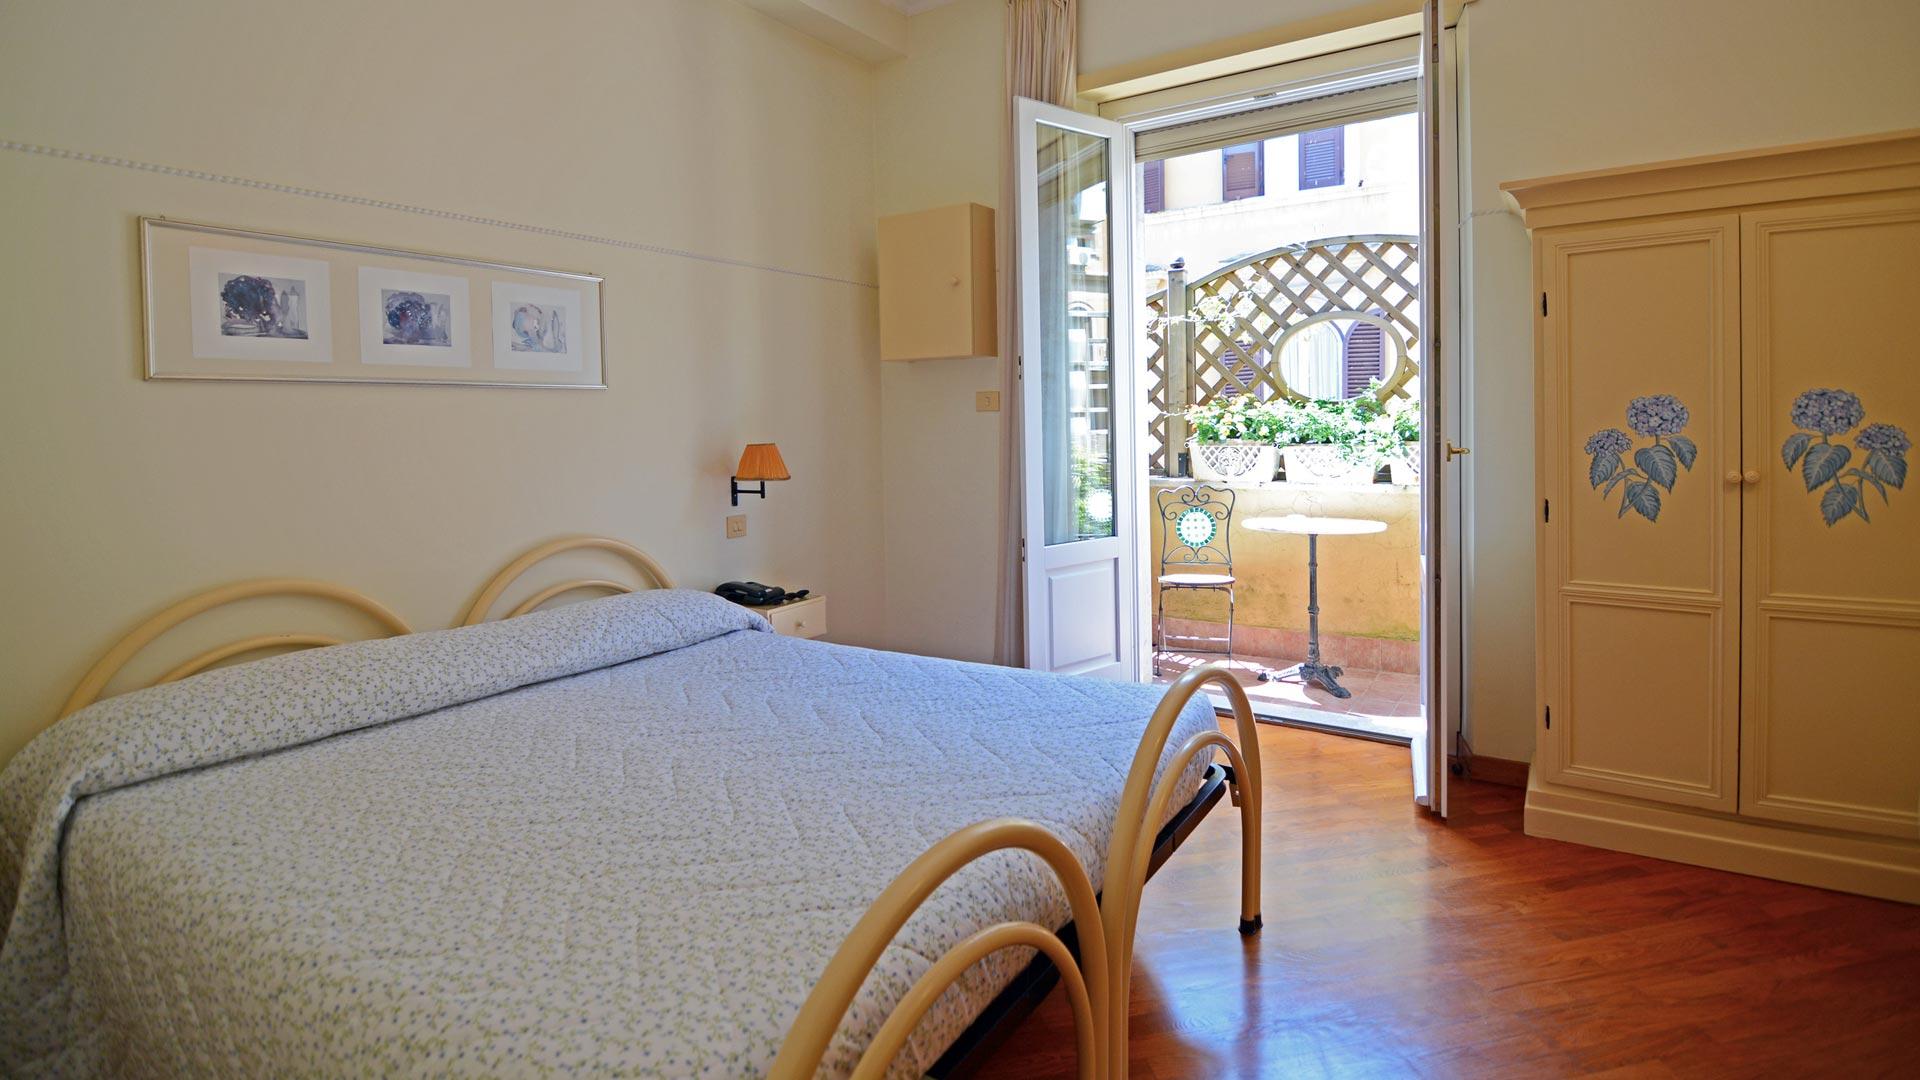 lilium-hotel-roma-37a